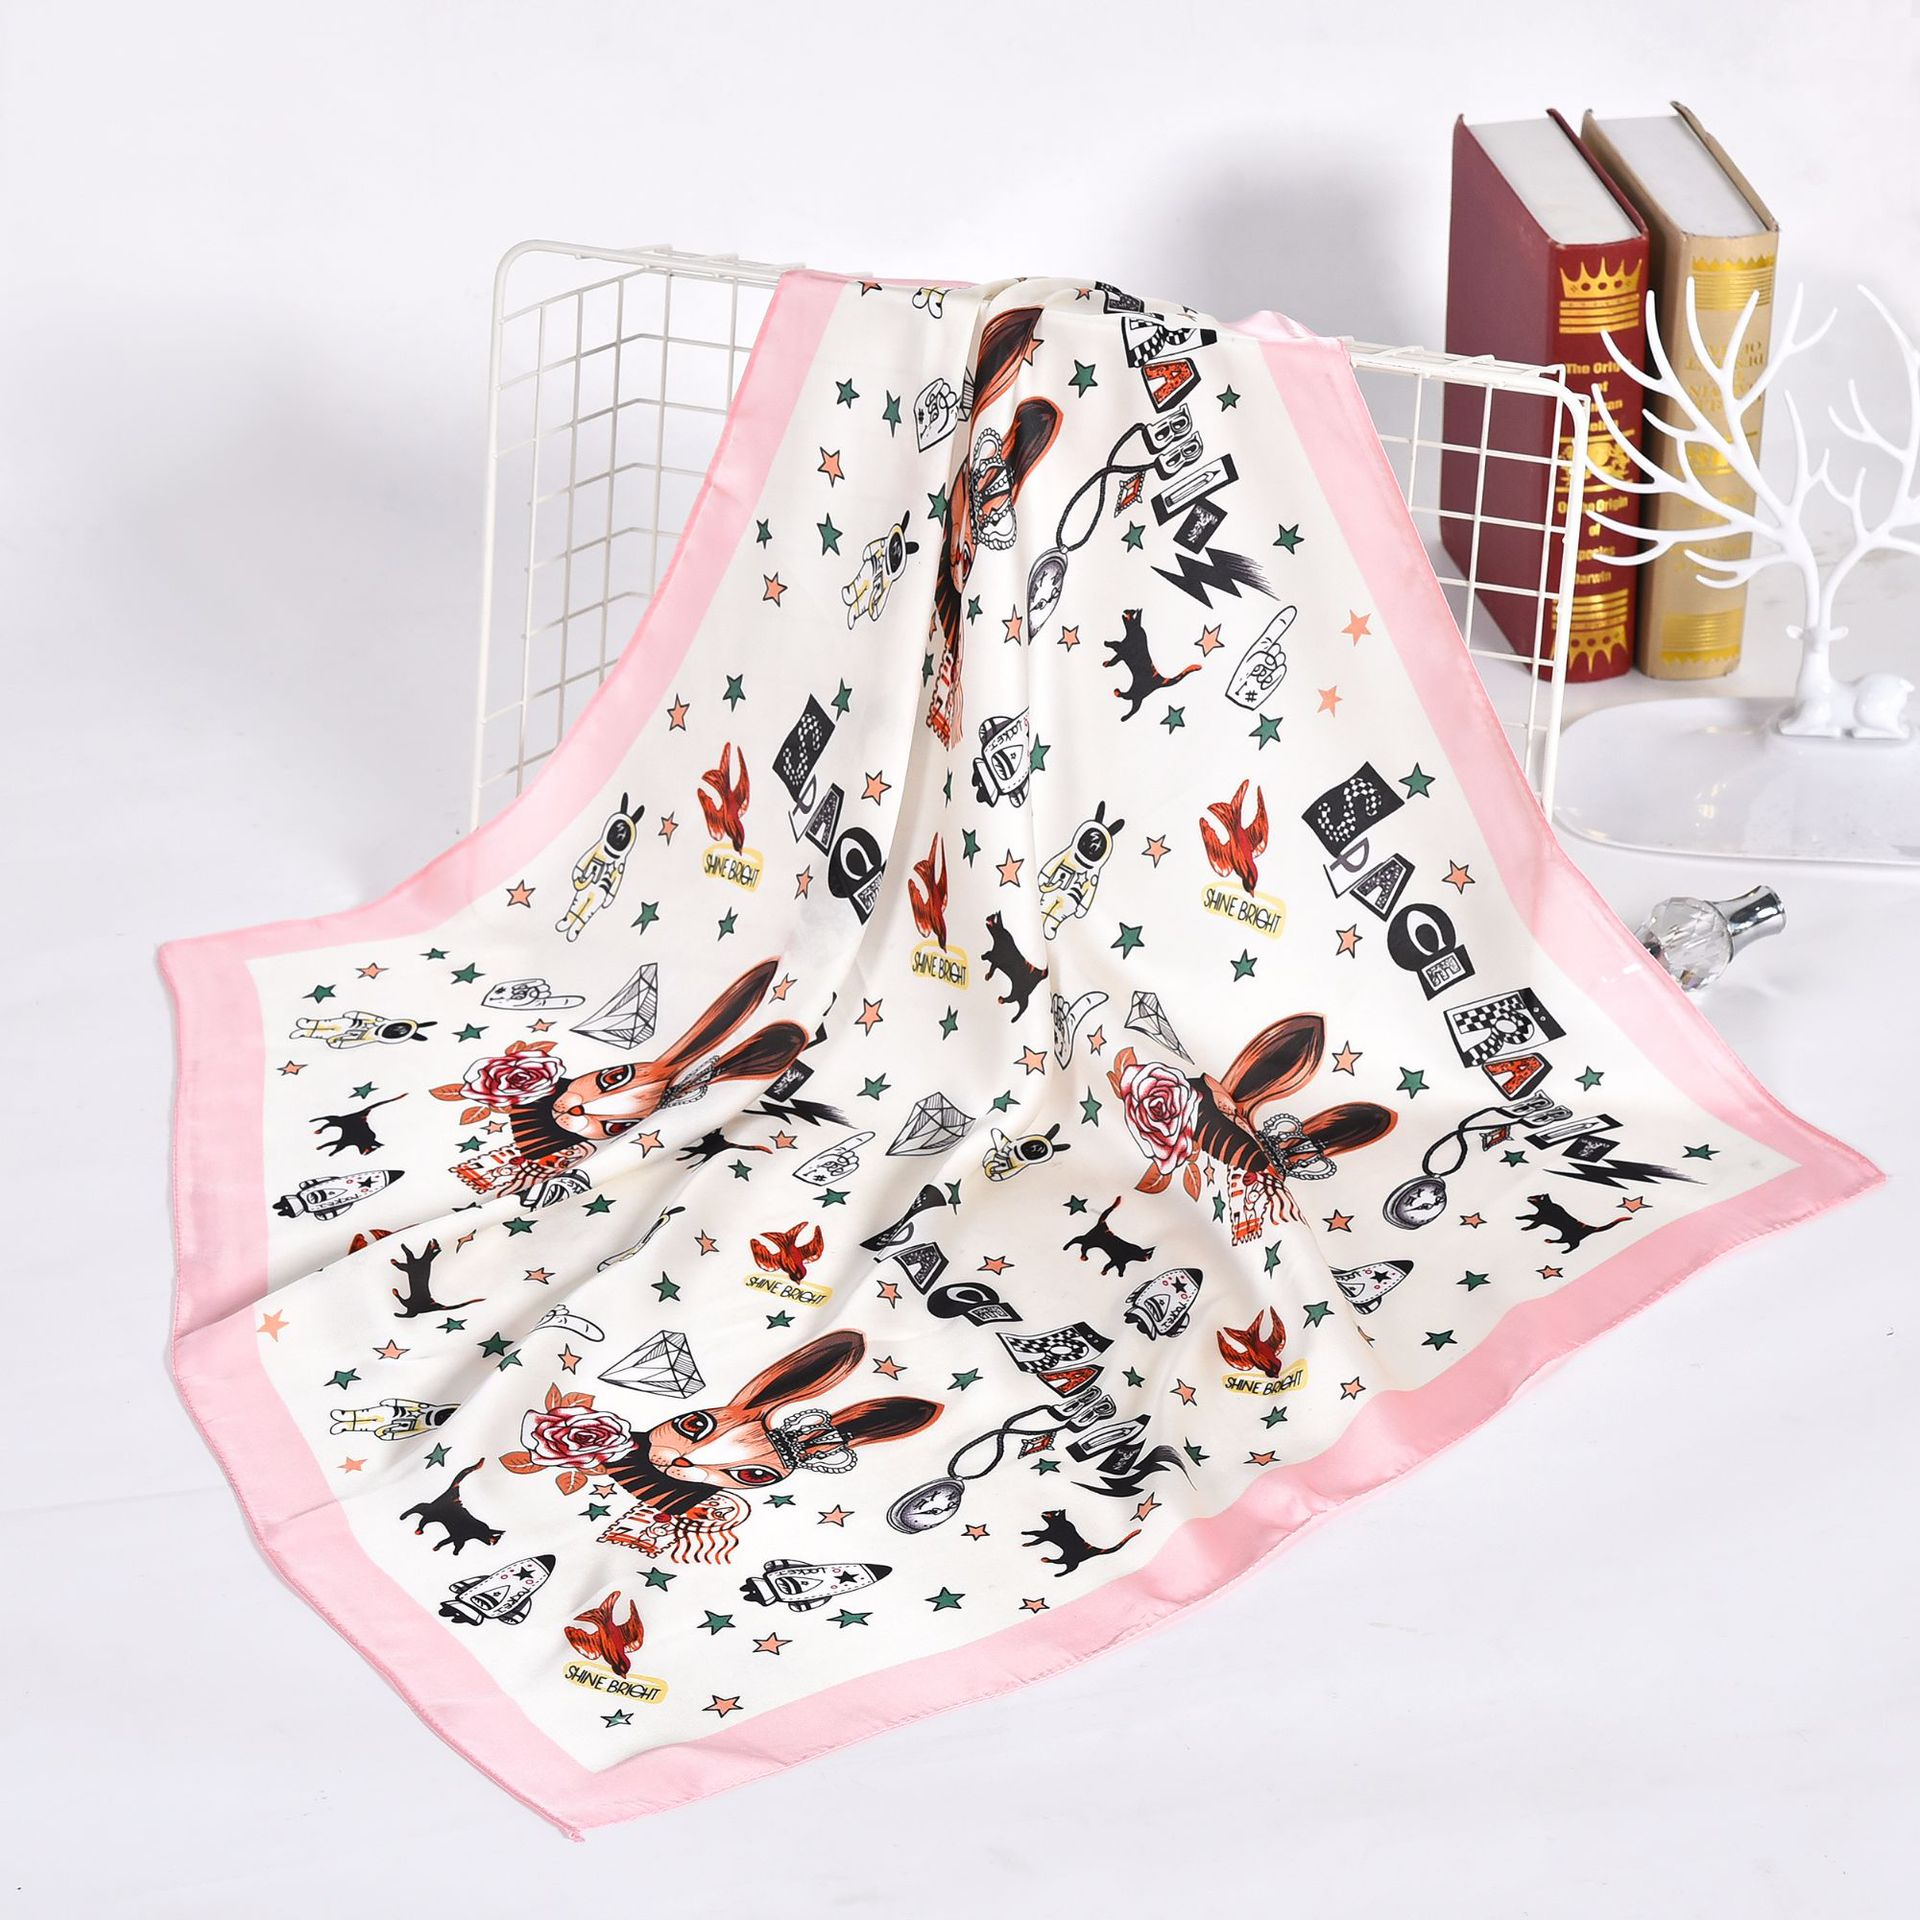 Small Shawls Silk Satin Hair Scarf For Women Fashion Cartoon Print Kerchief Bandana Head Scarfs 70*70cm Neck Scarves For Ladies